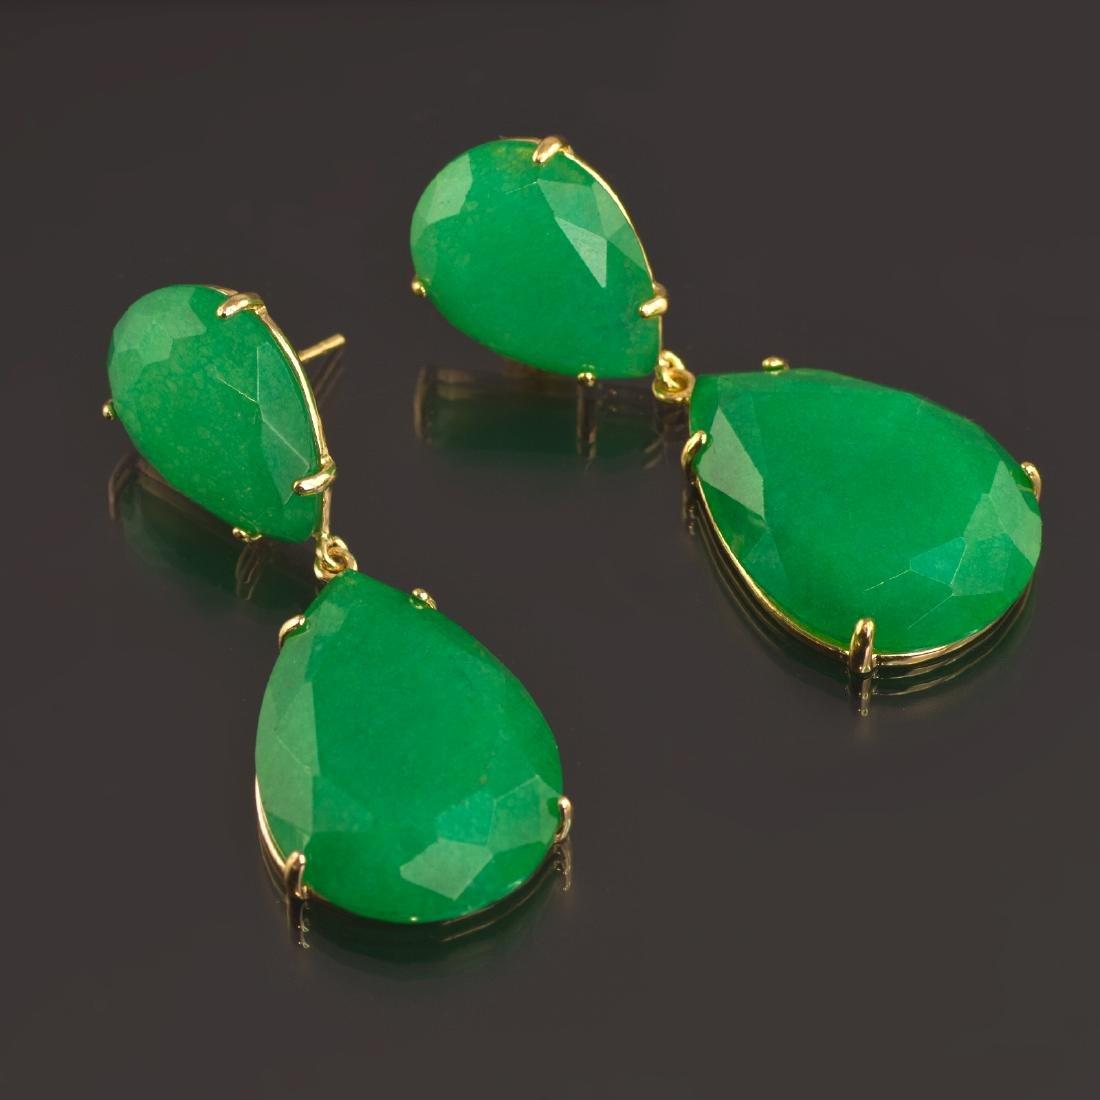 Emerald Green Jade Two Parts Earrings - 3